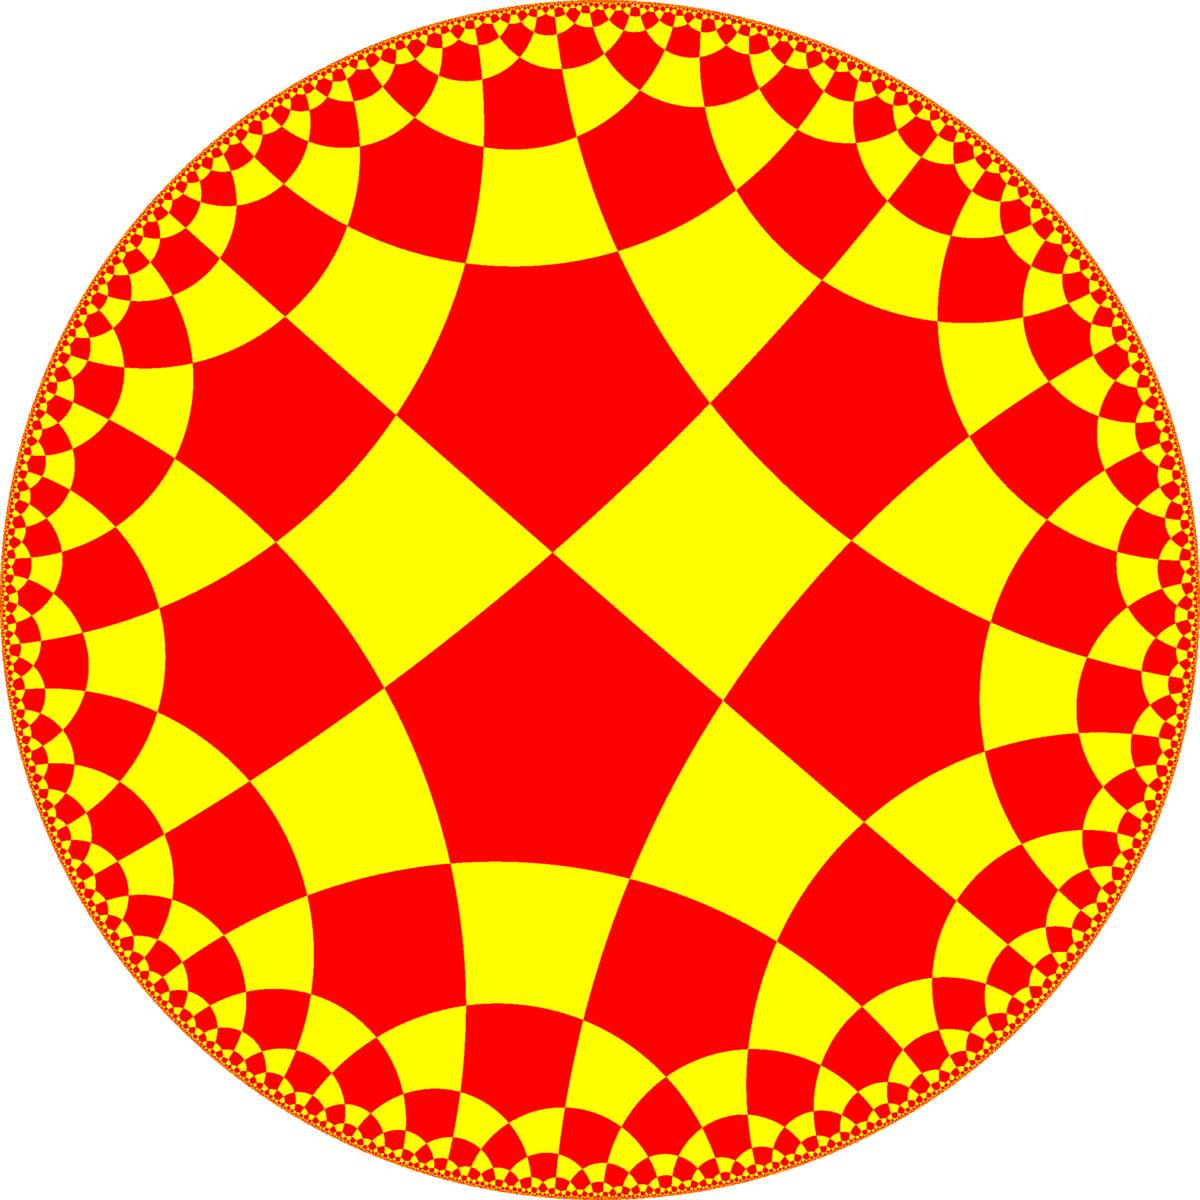 Tetrapentagonal tiling wikipedia . Honeycomb clipart geometric